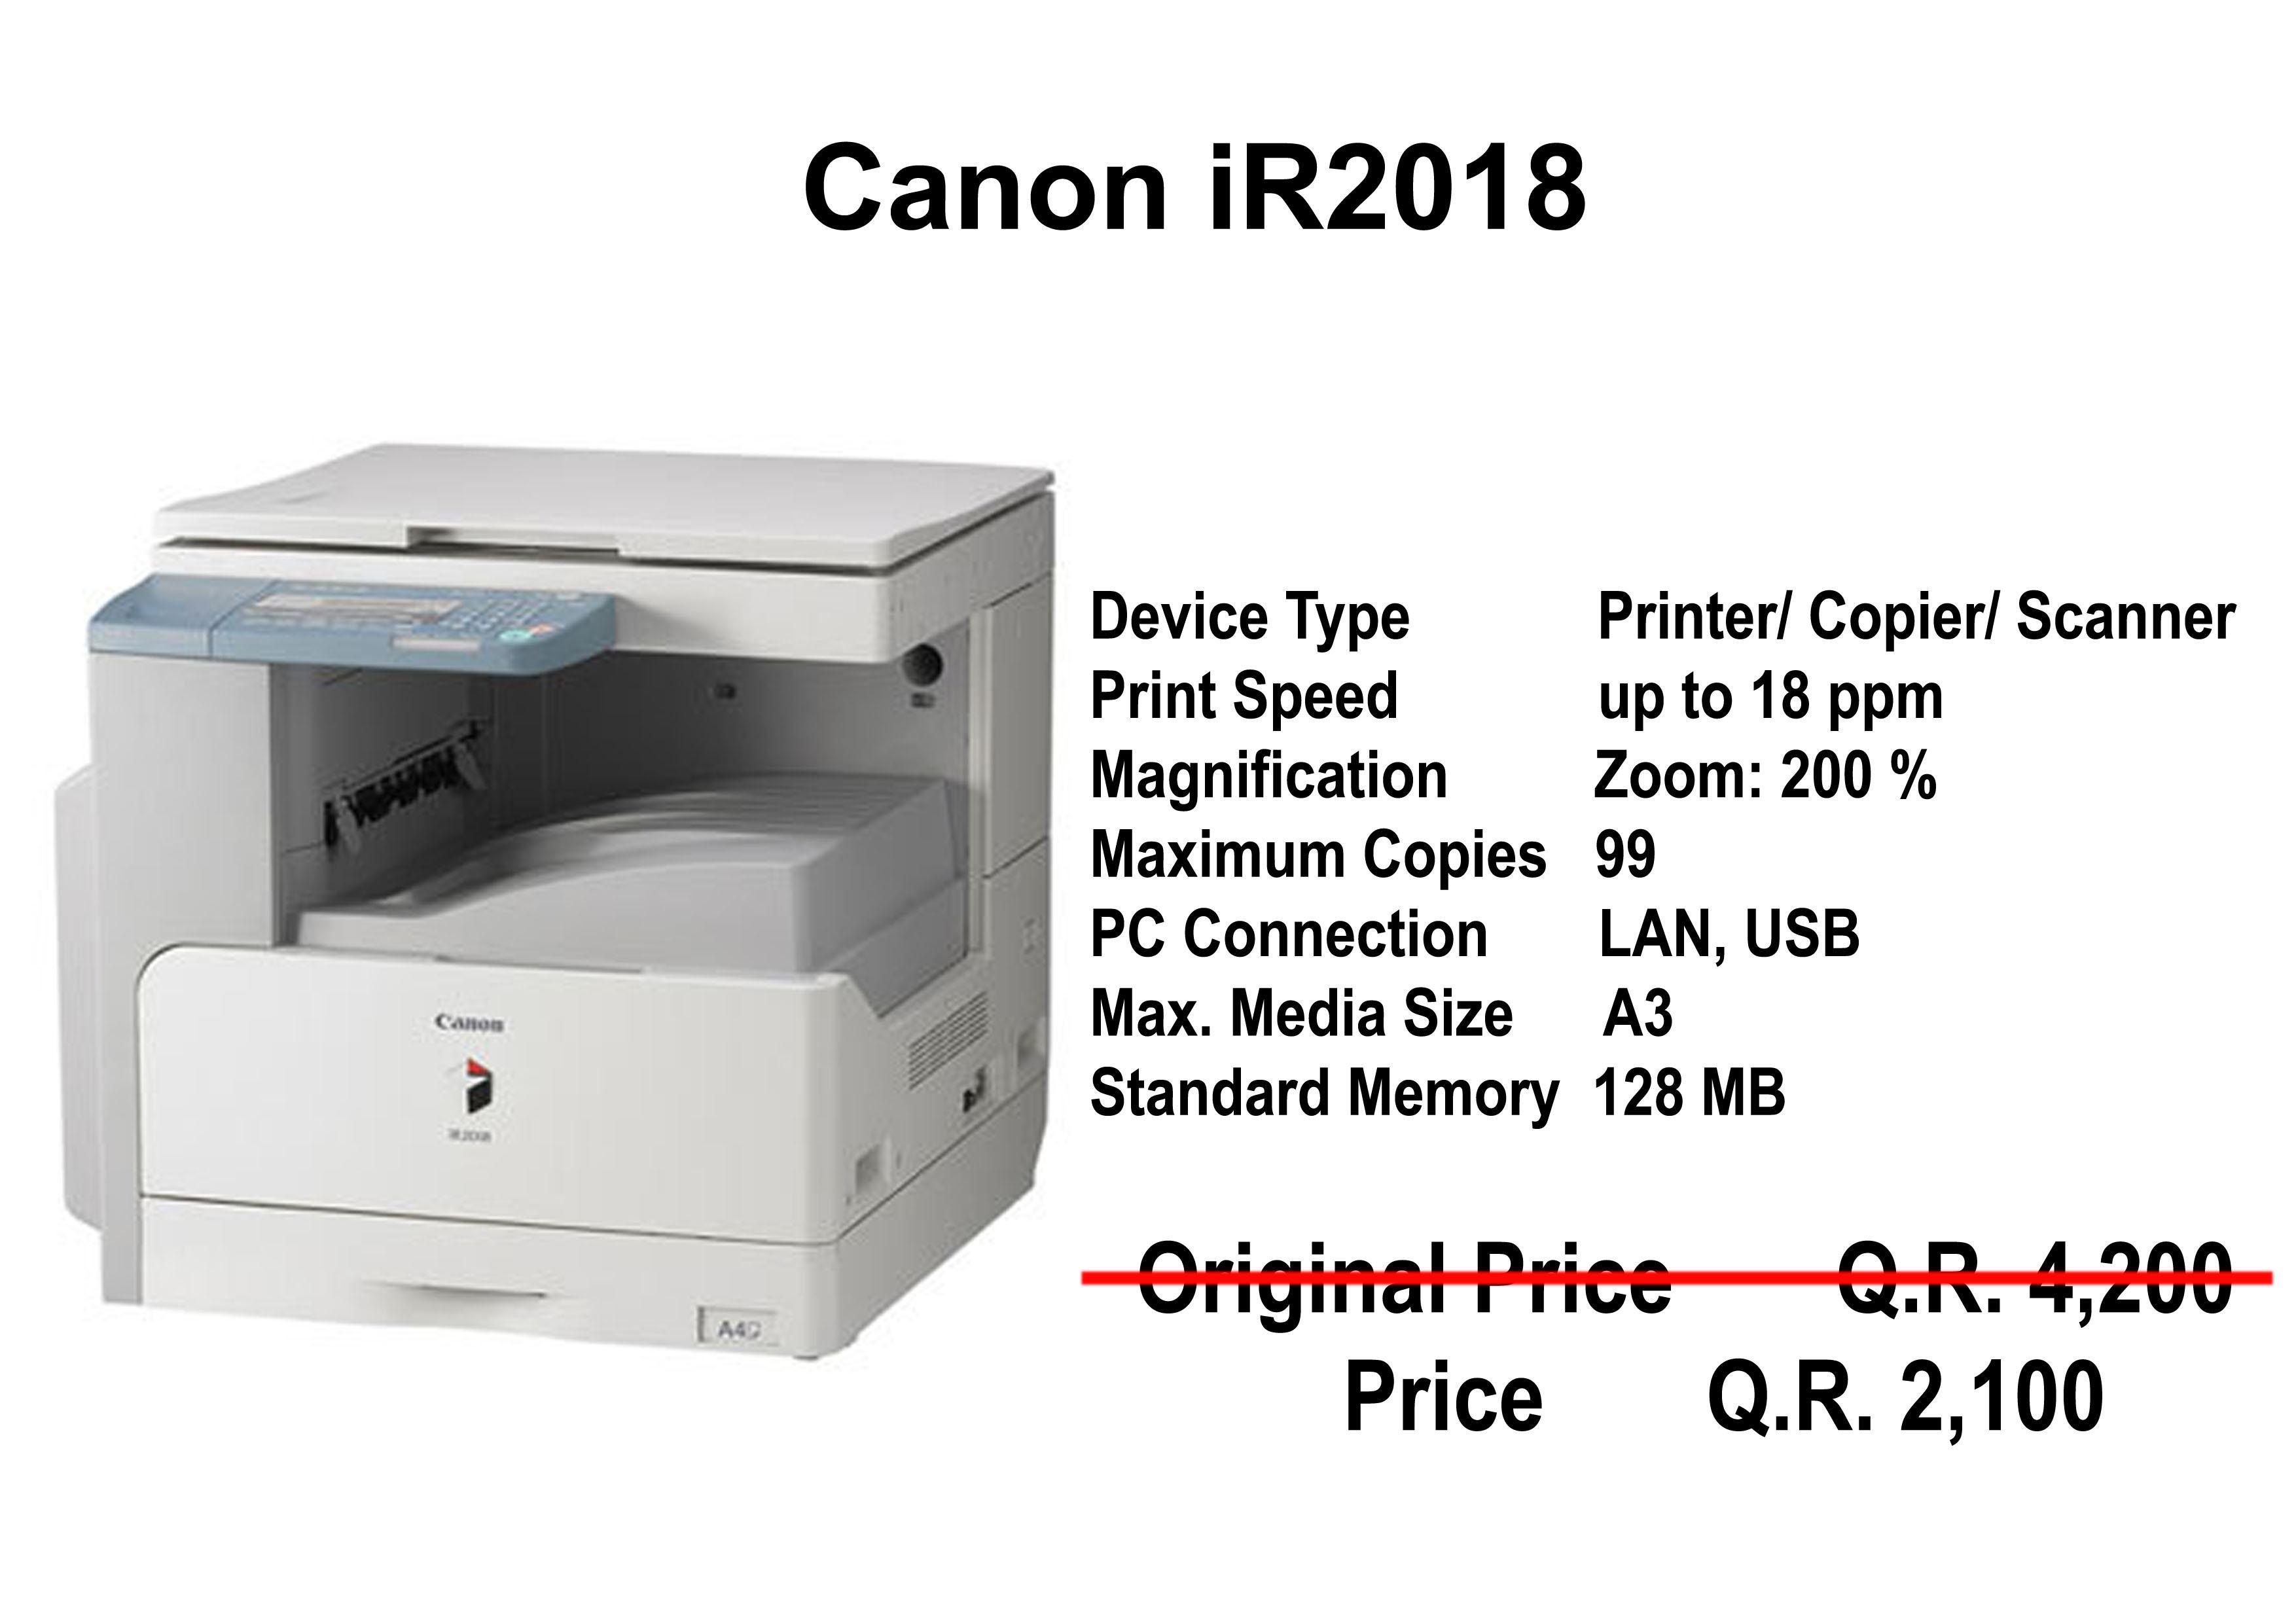 Canon Printer Drivers For Windows 7